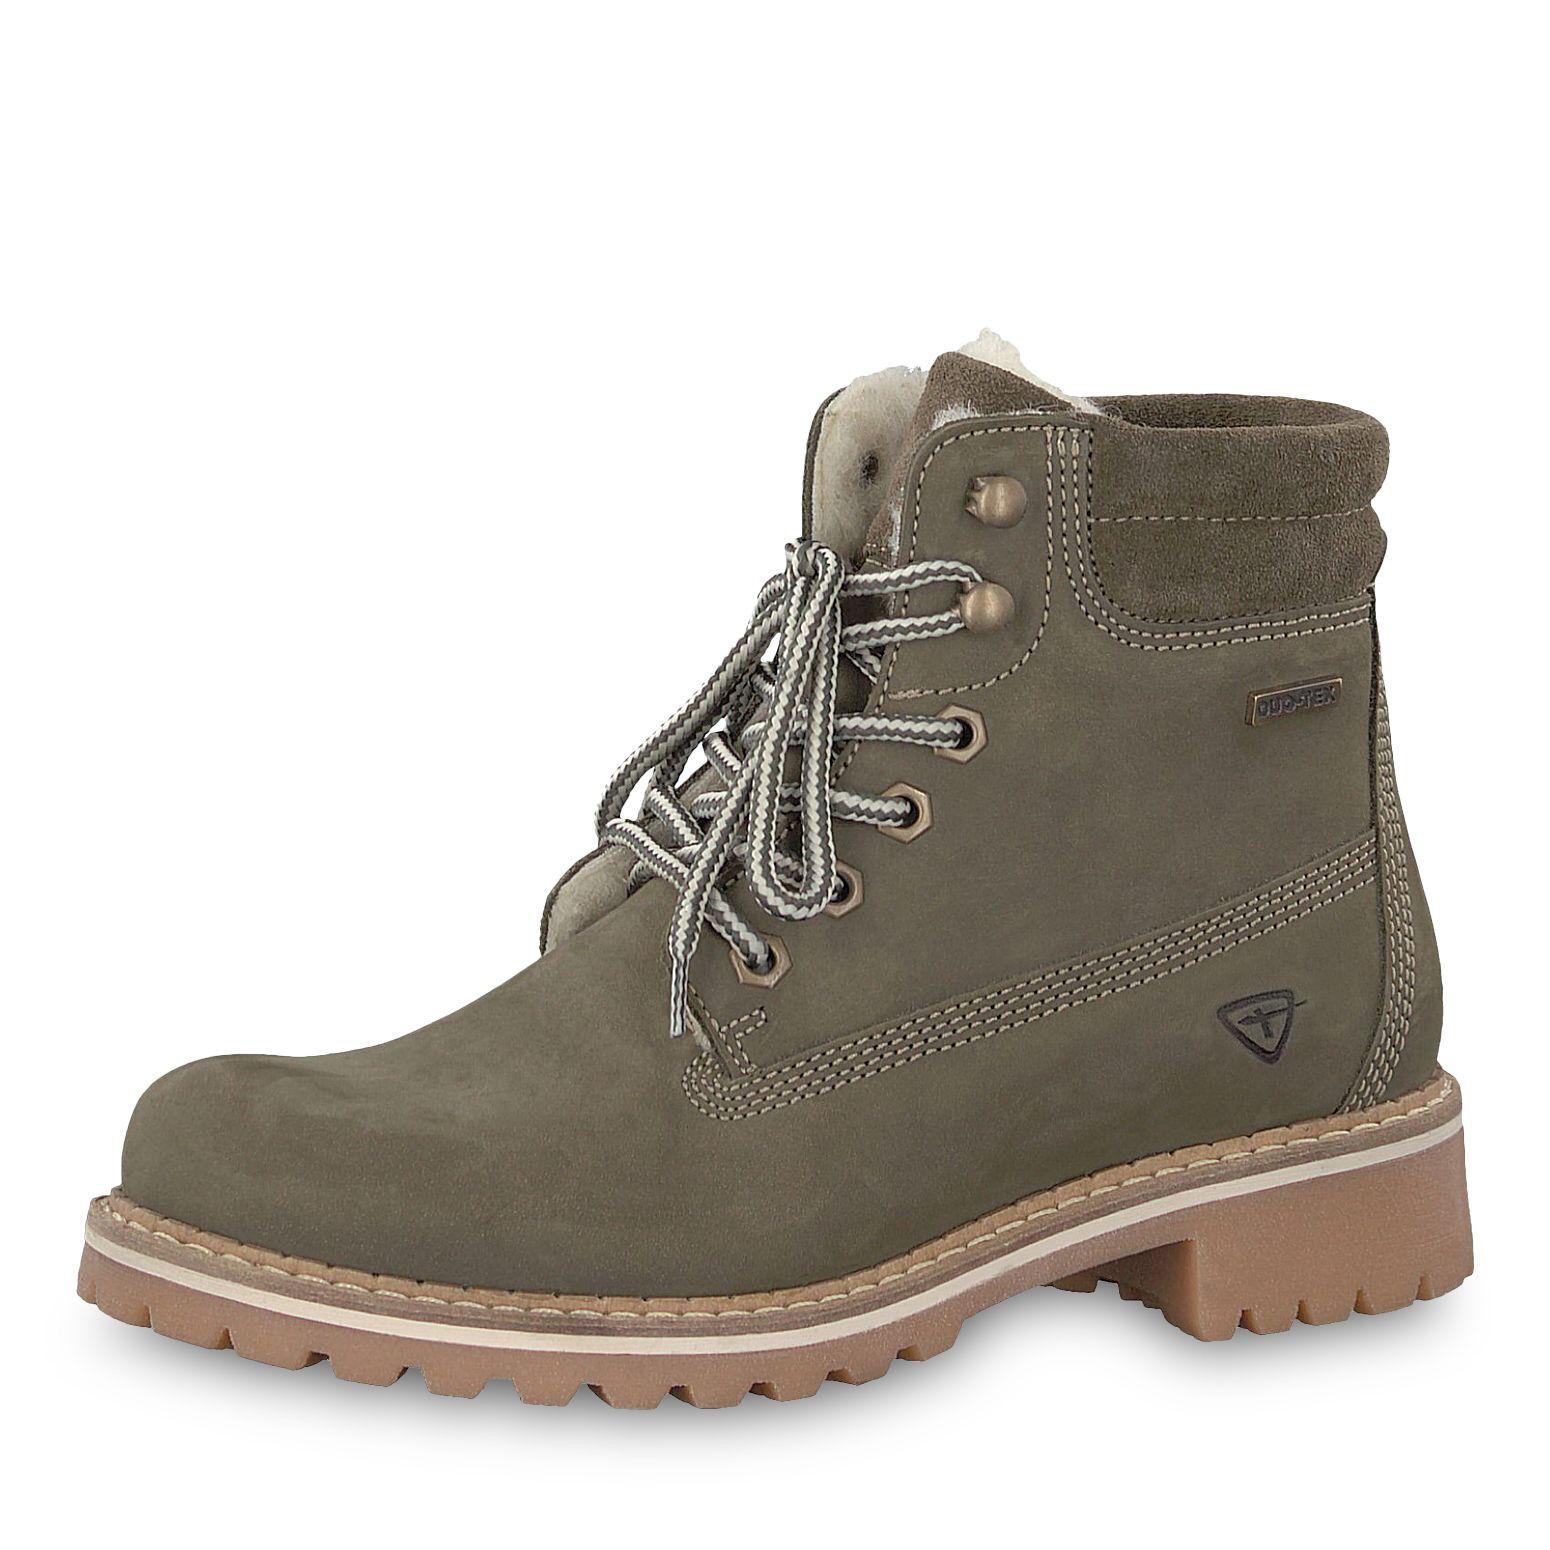 Tamaris Womens Boots Size 5.5 UK